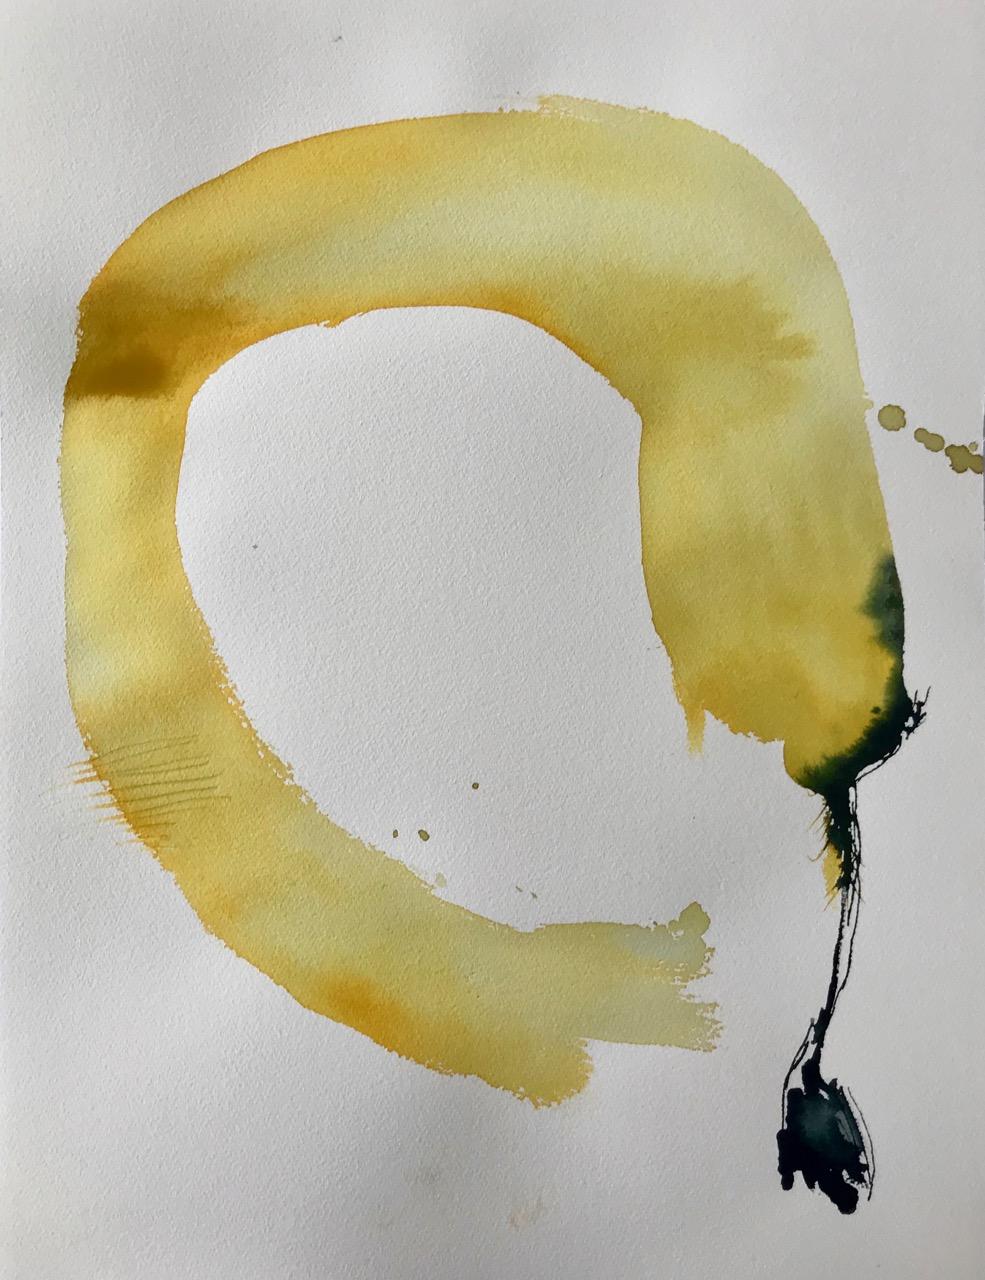 Banananana, Pt.1, Aquarell und Tusche auf Papier, 46 x 61 cm, 2018